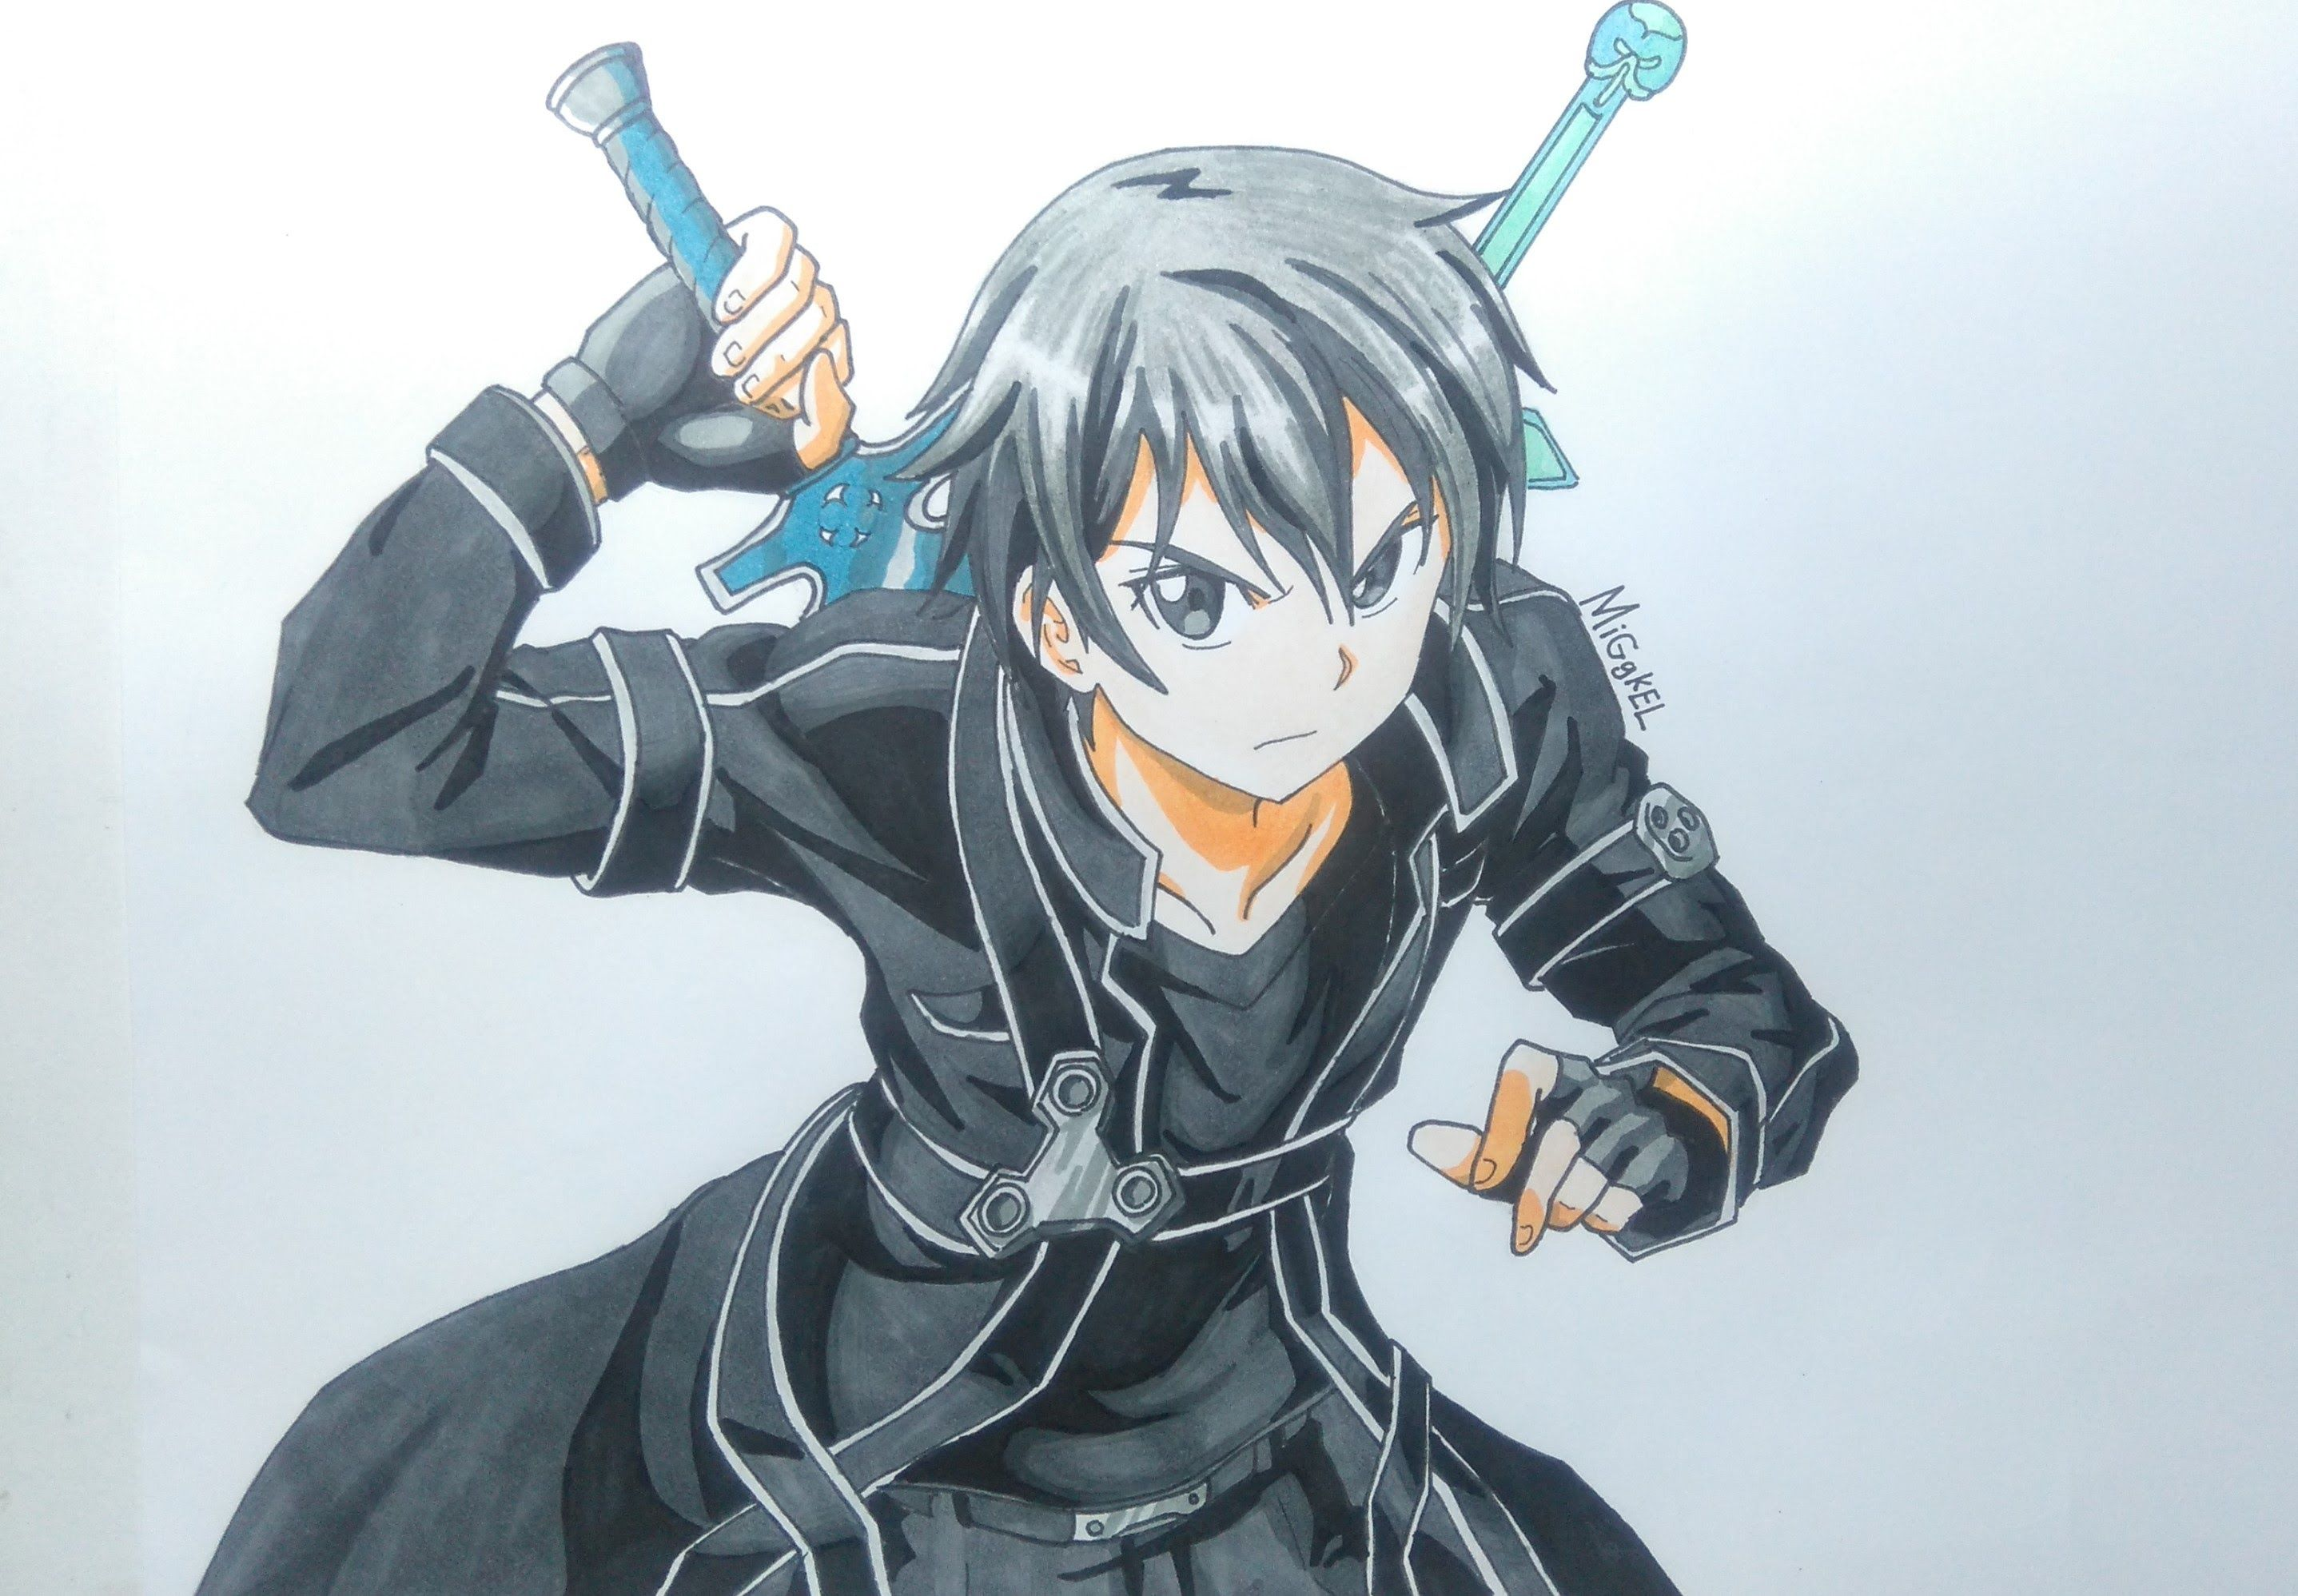 Kiritokun Sword art, Sword art online, Sword drawing